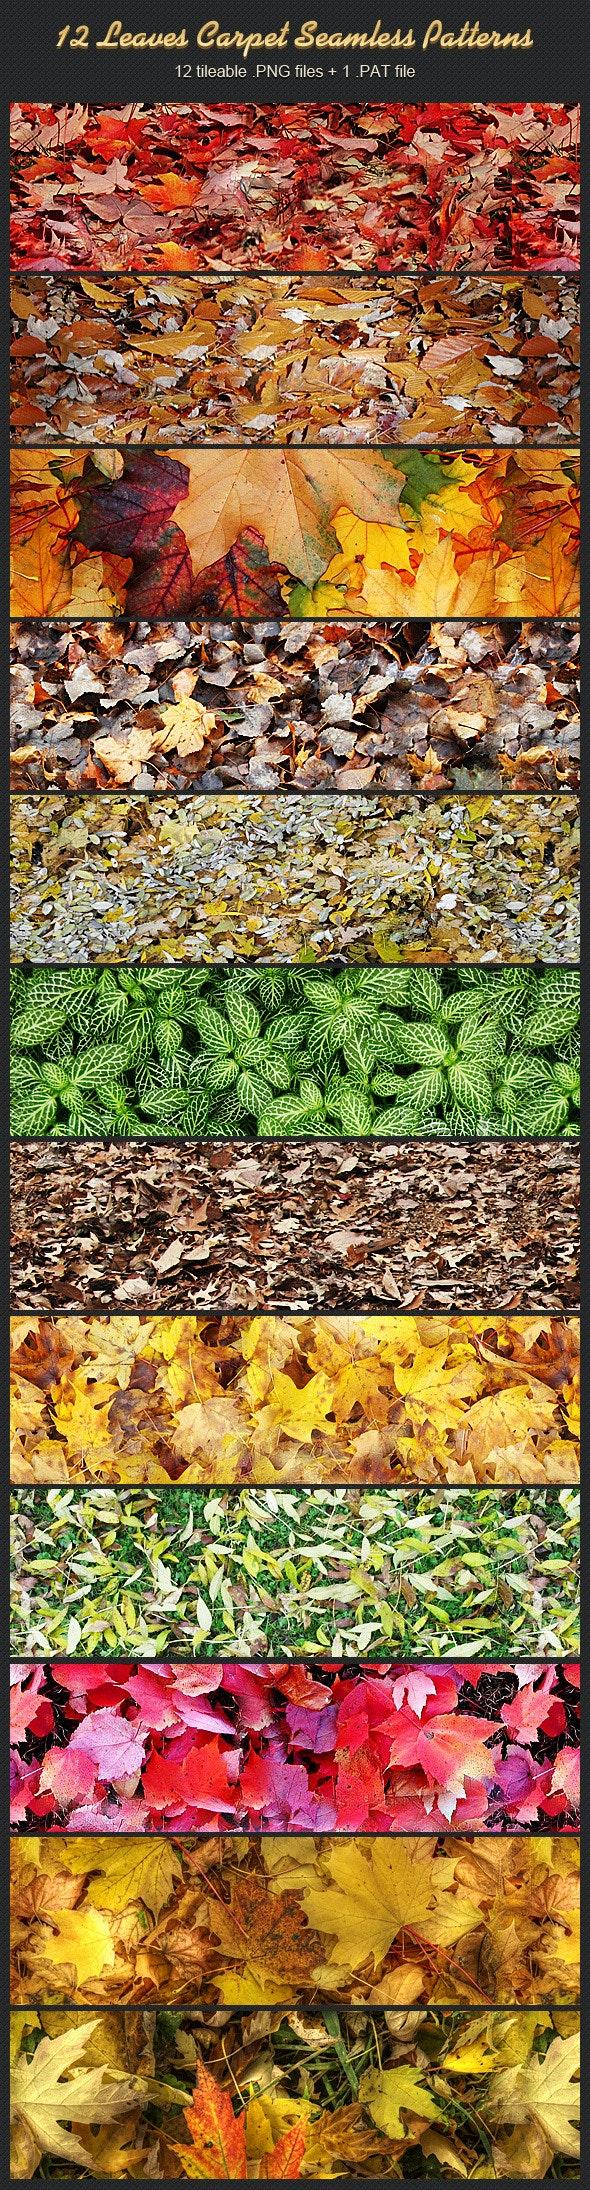 12 Leaves Carpet Seamless Patterns - Nature Textures / Fills / Patterns